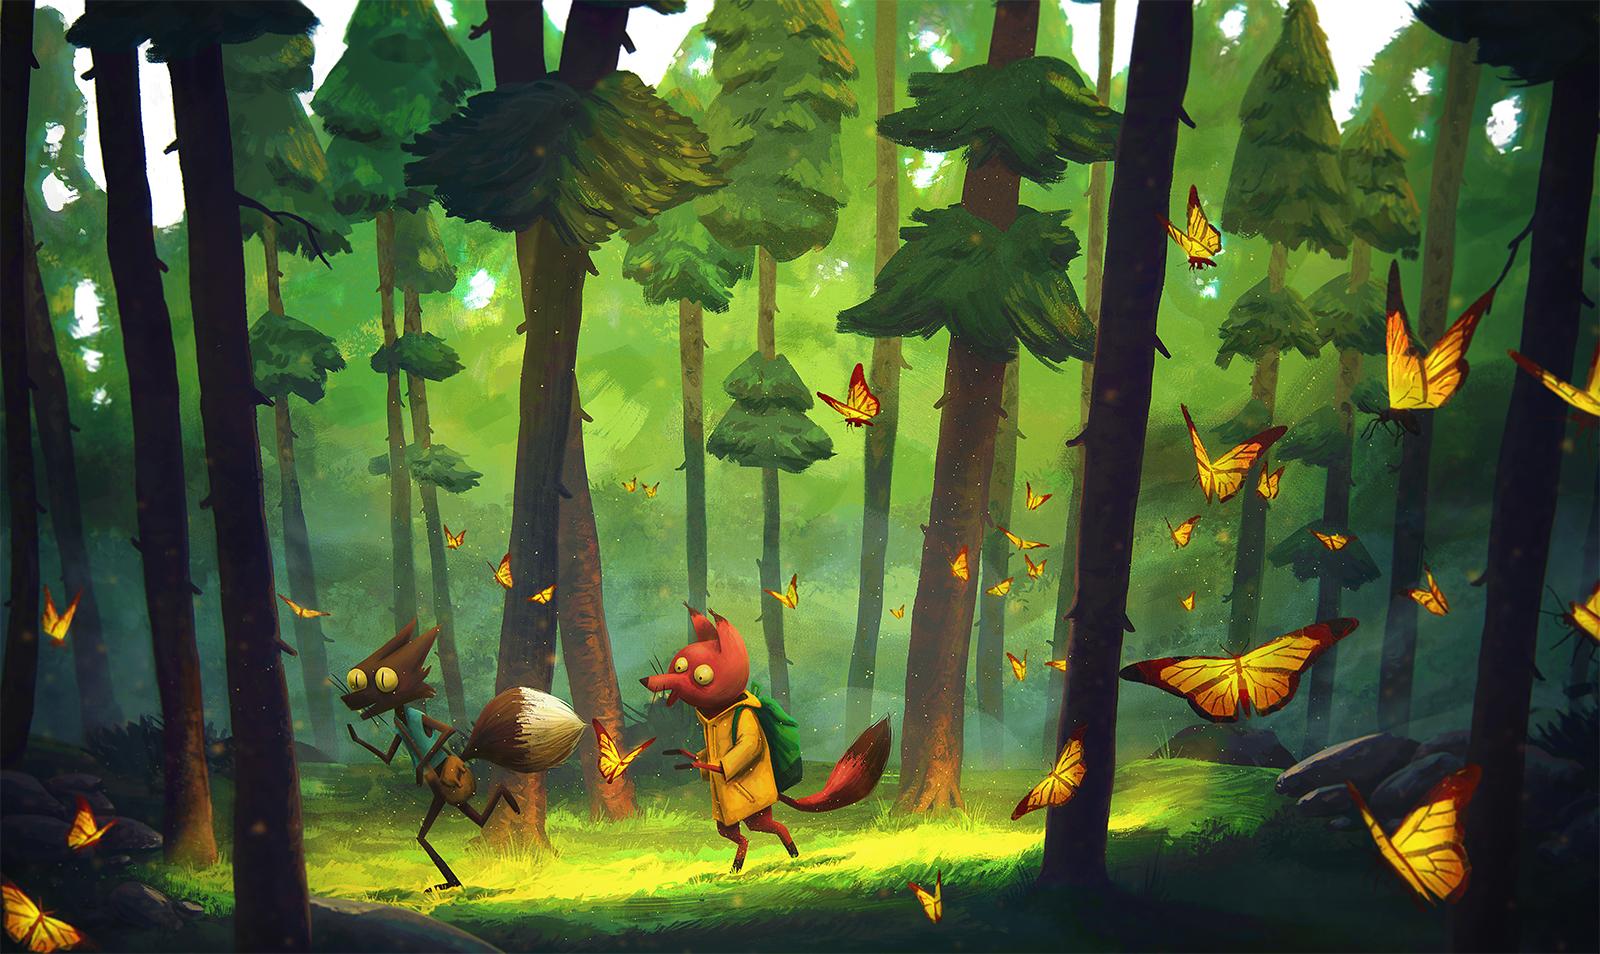 fox&catEvironment3_greenforrest_w1600.jpg